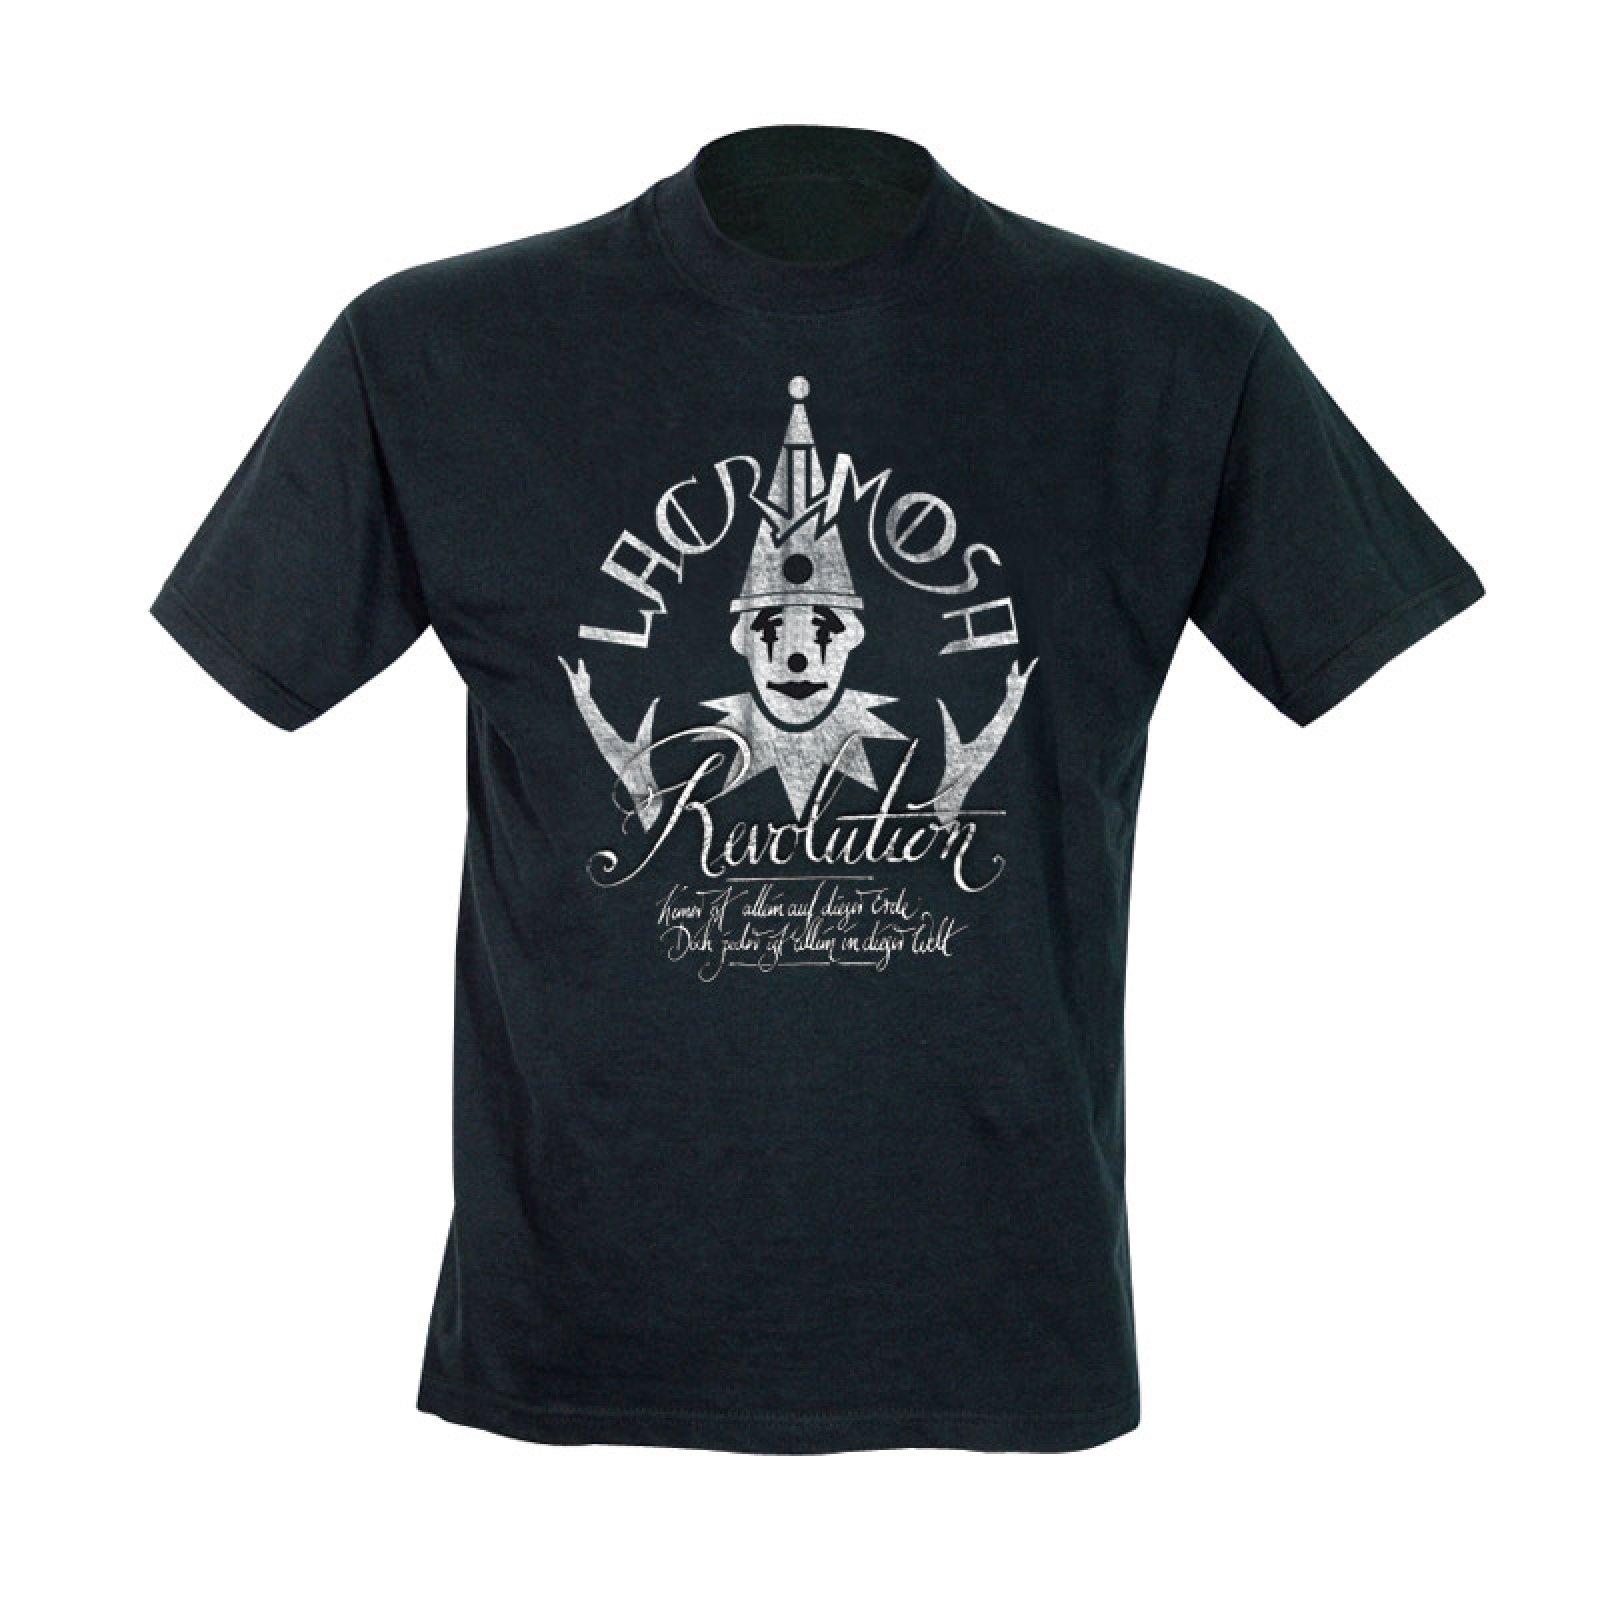 T shirt revolution grunge logo for T shirt with logo